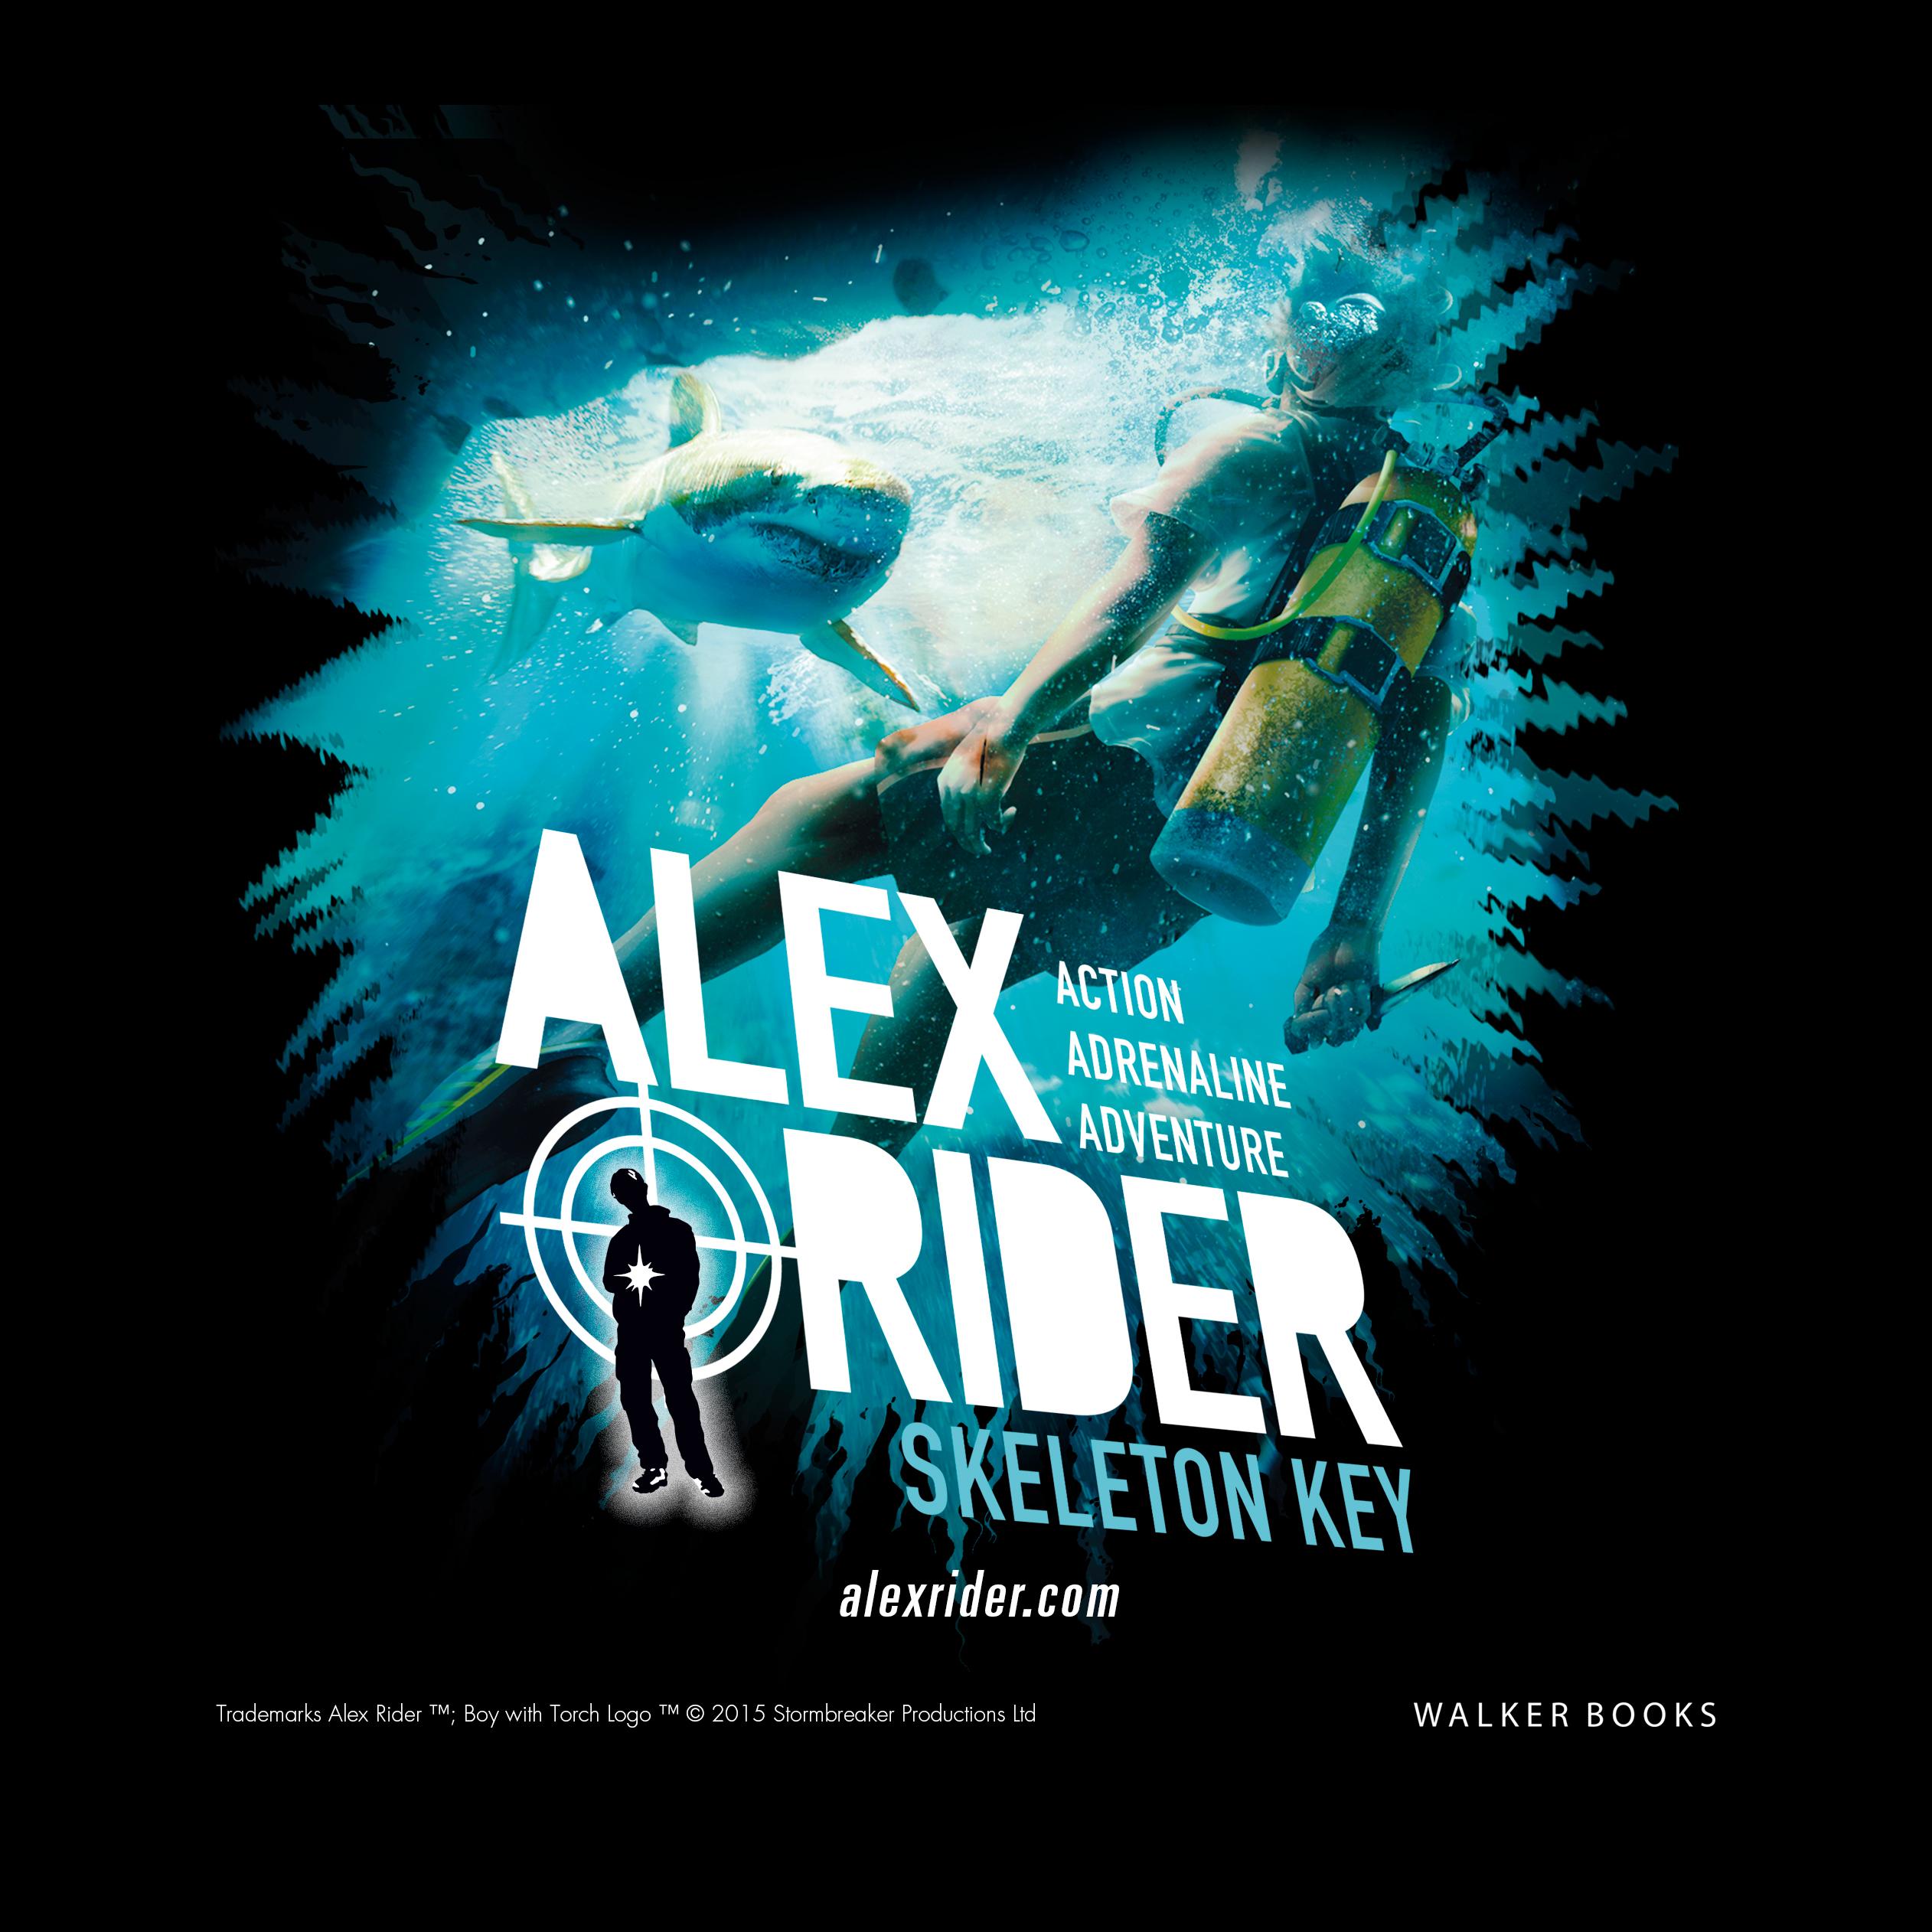 The alex rider series audiobooks   audiobook series   download.